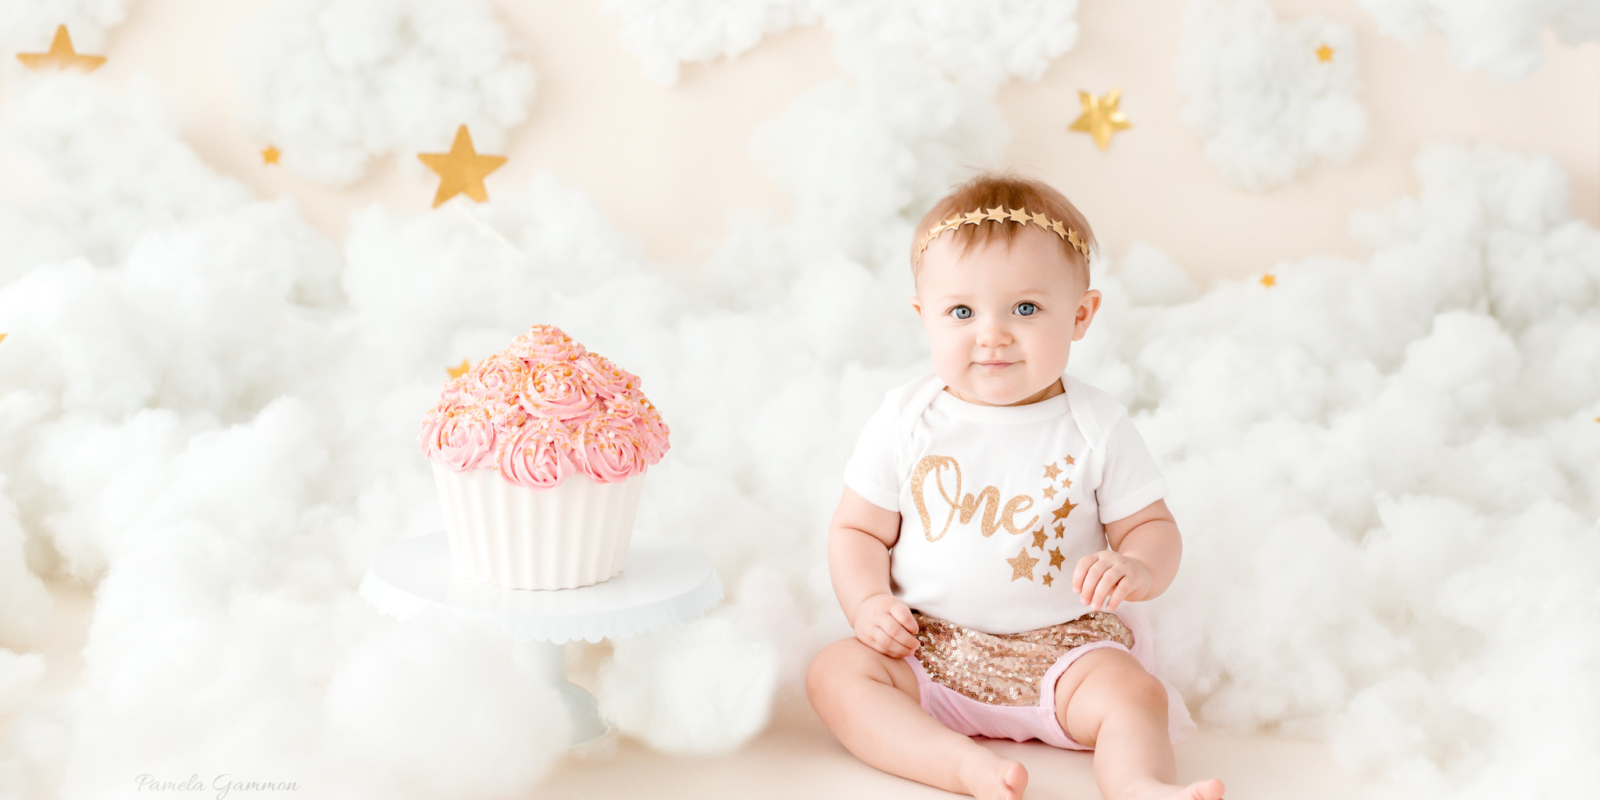 Twinkle Twinkle Little Star Cake Smash Session KY